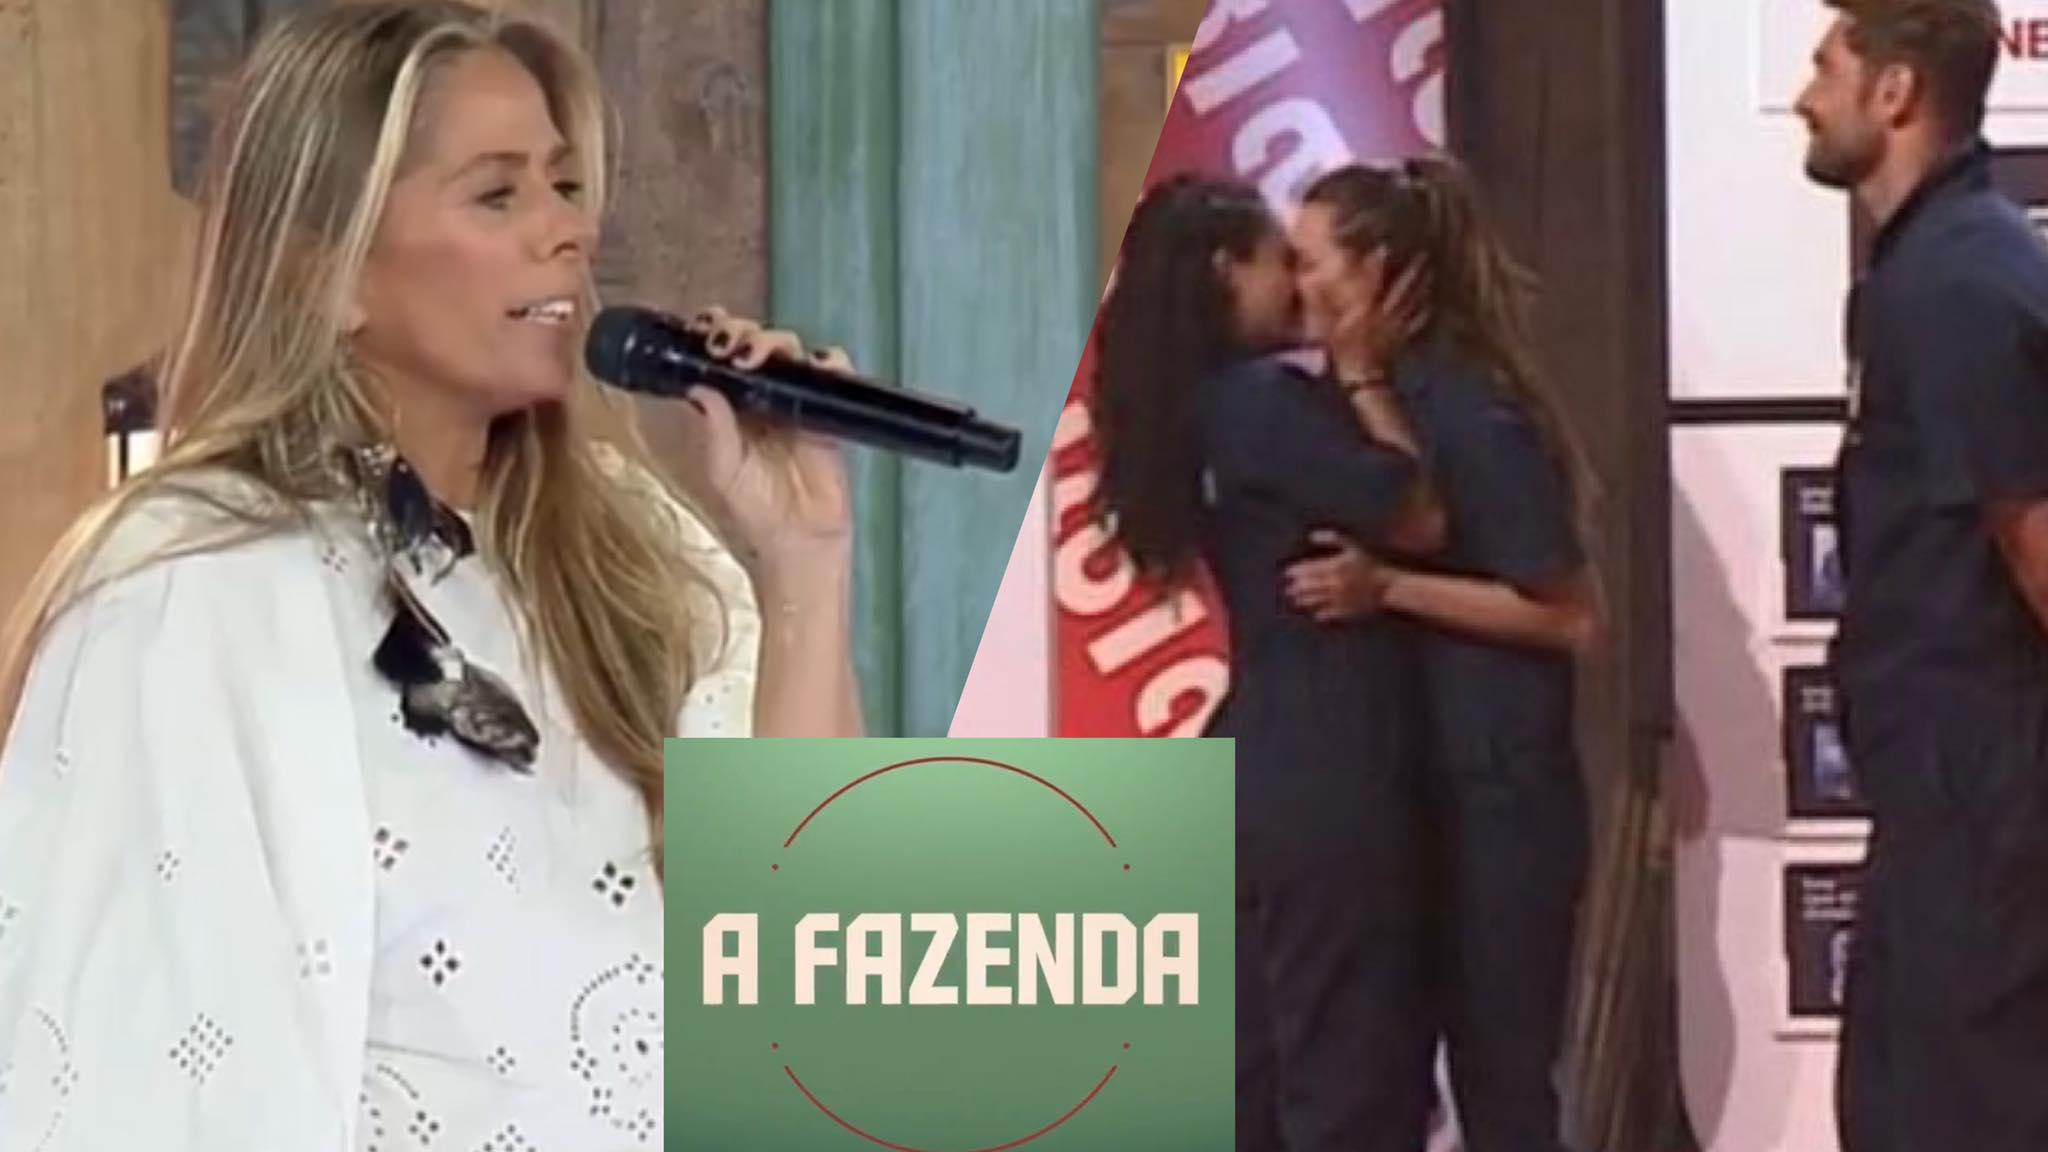 A Fazenda 2021, Aline Mineiro, Dayane Mello,